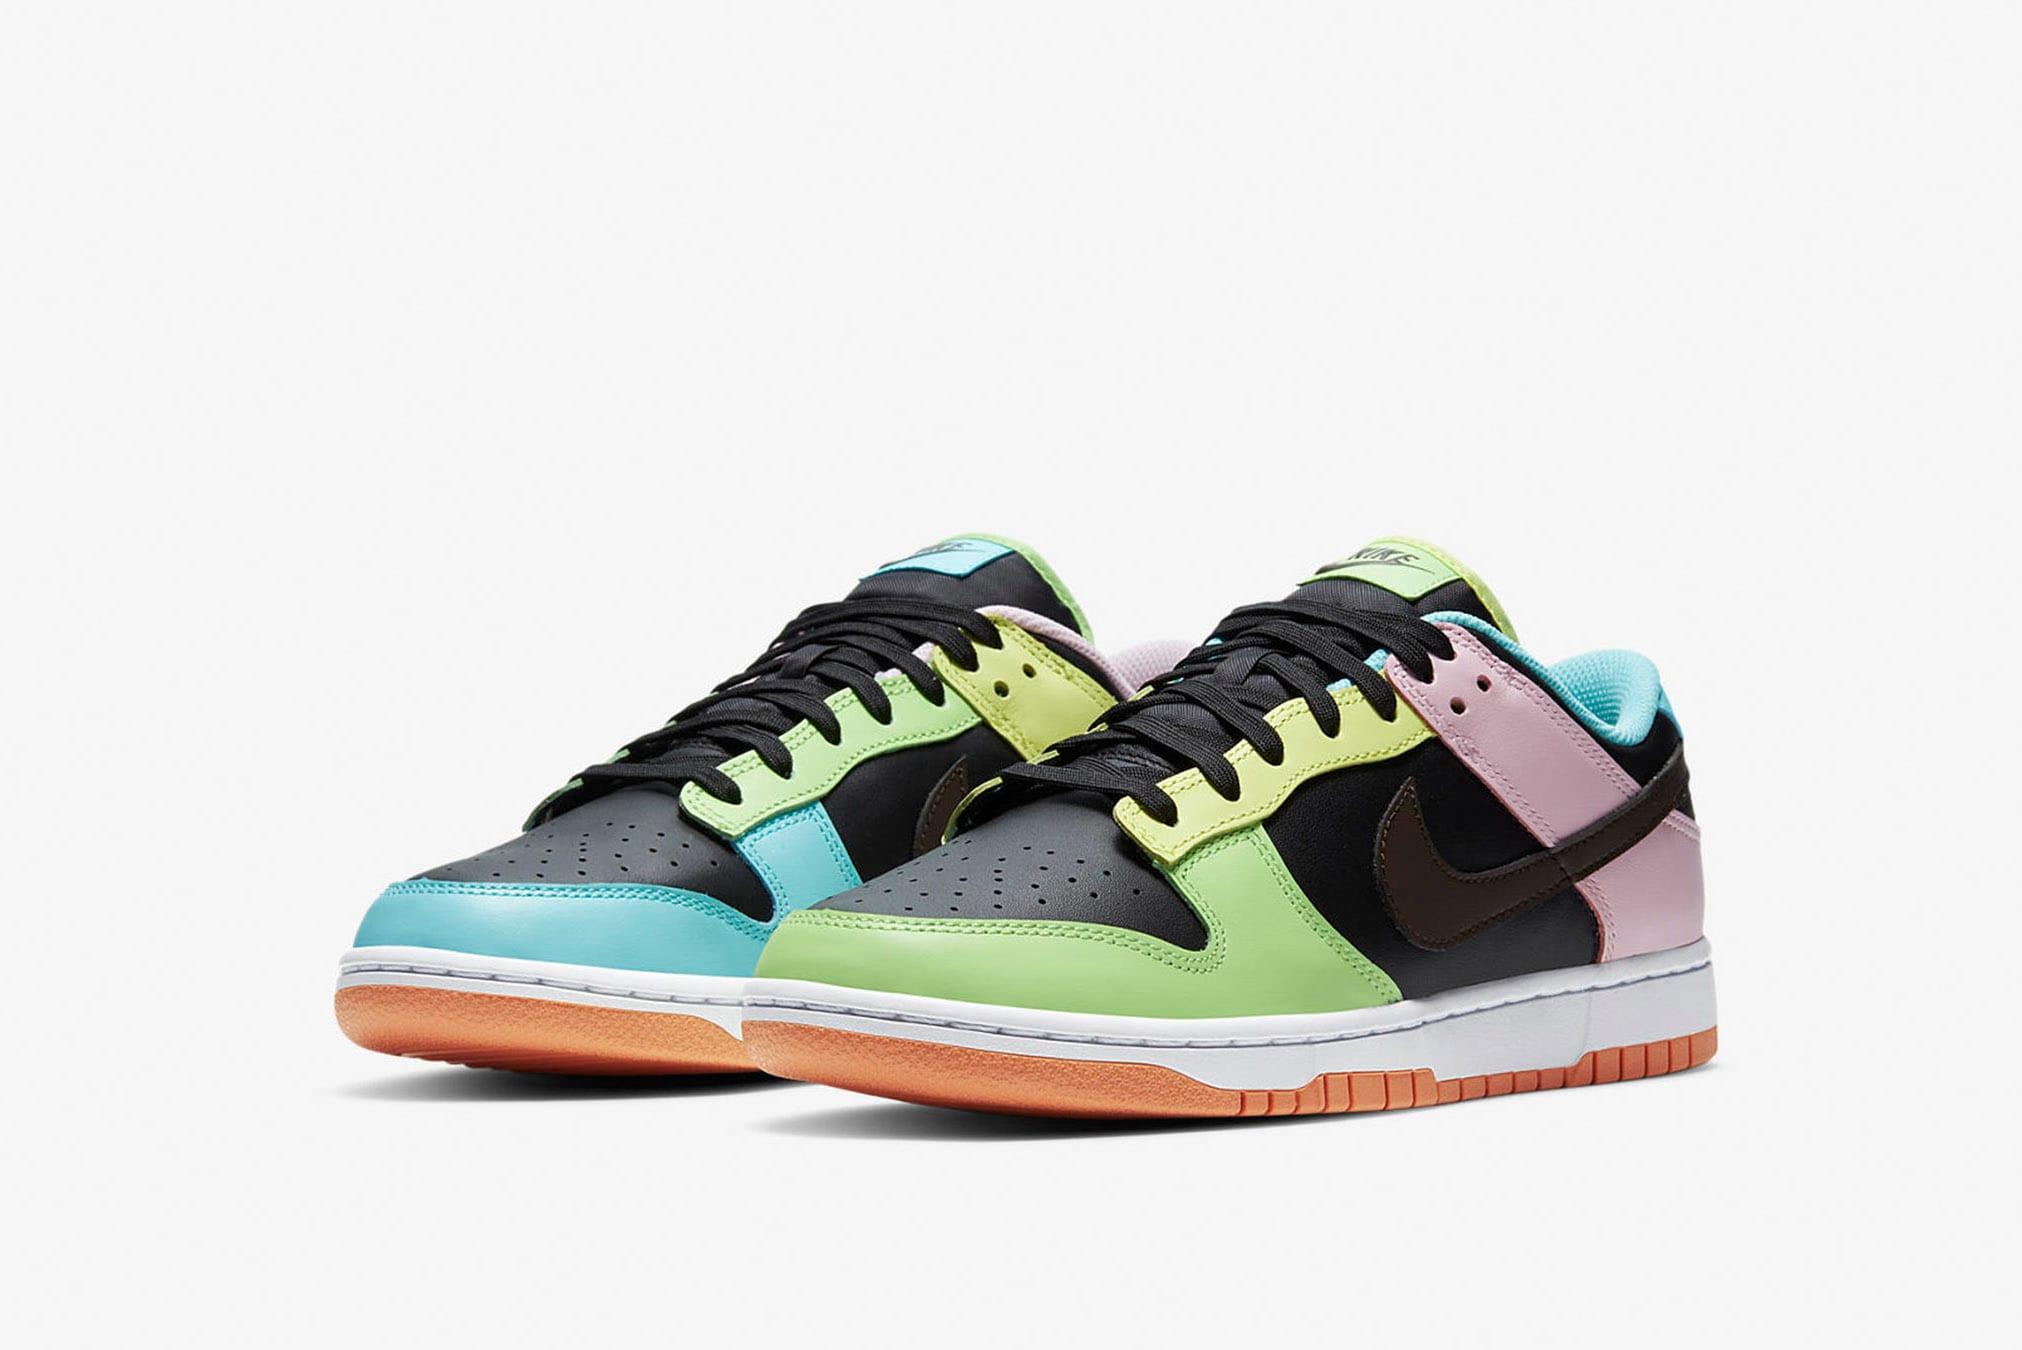 Nike Dunk Low SE Free 99 - DH0952-001